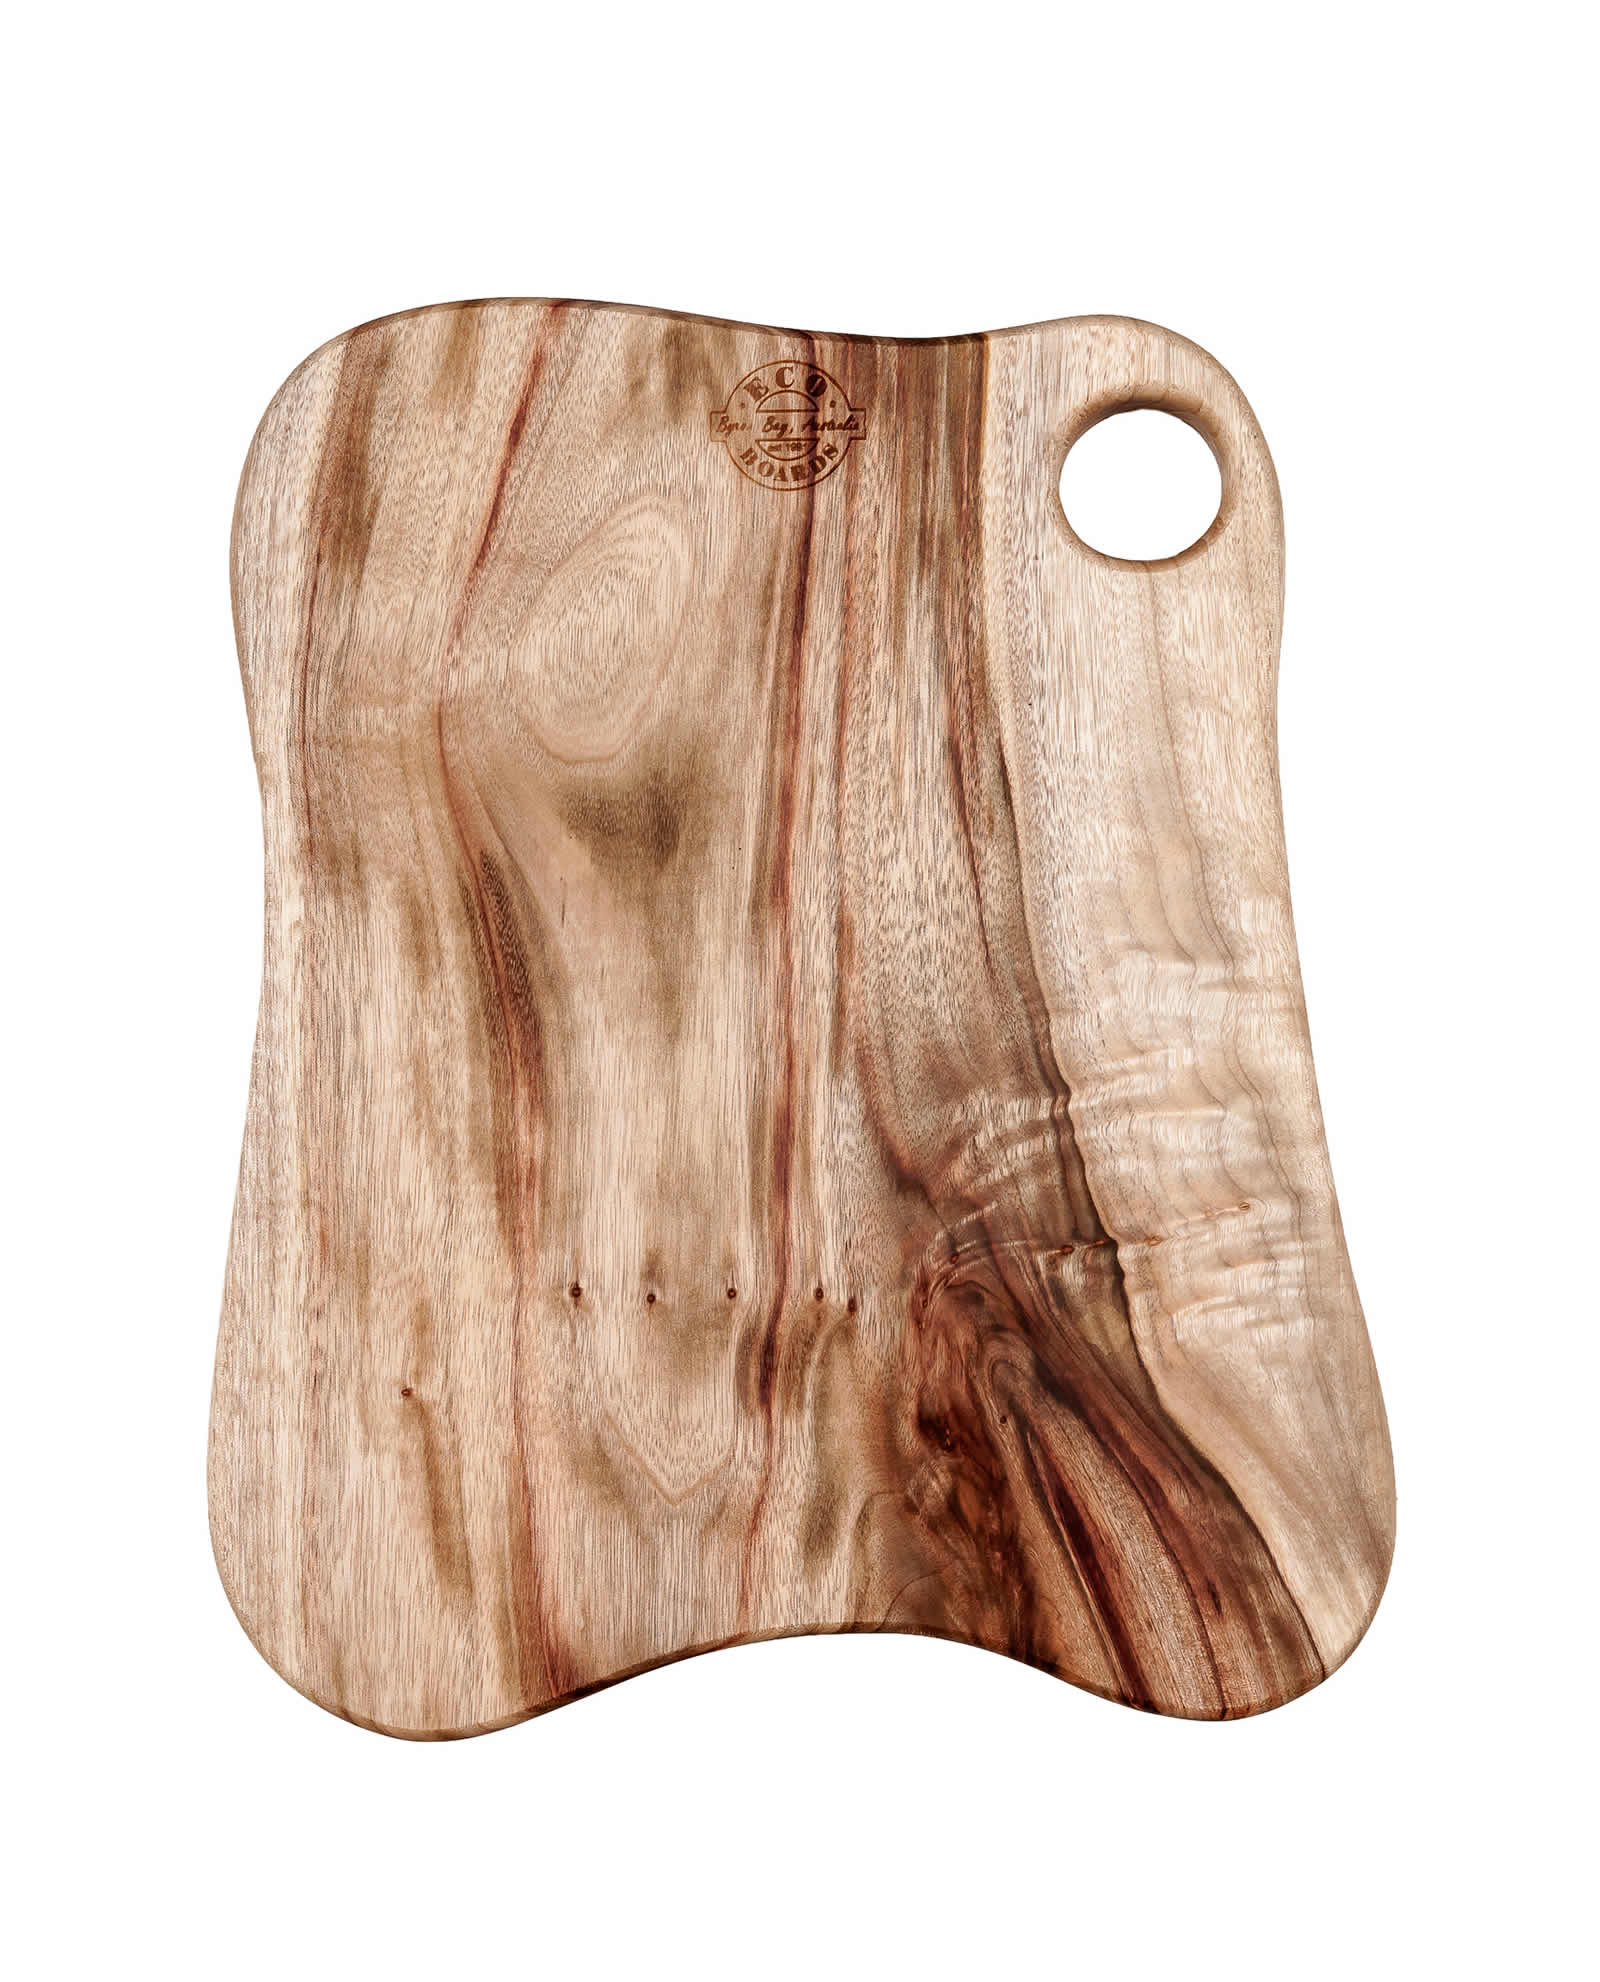 Main Arm Medium Chopping Board